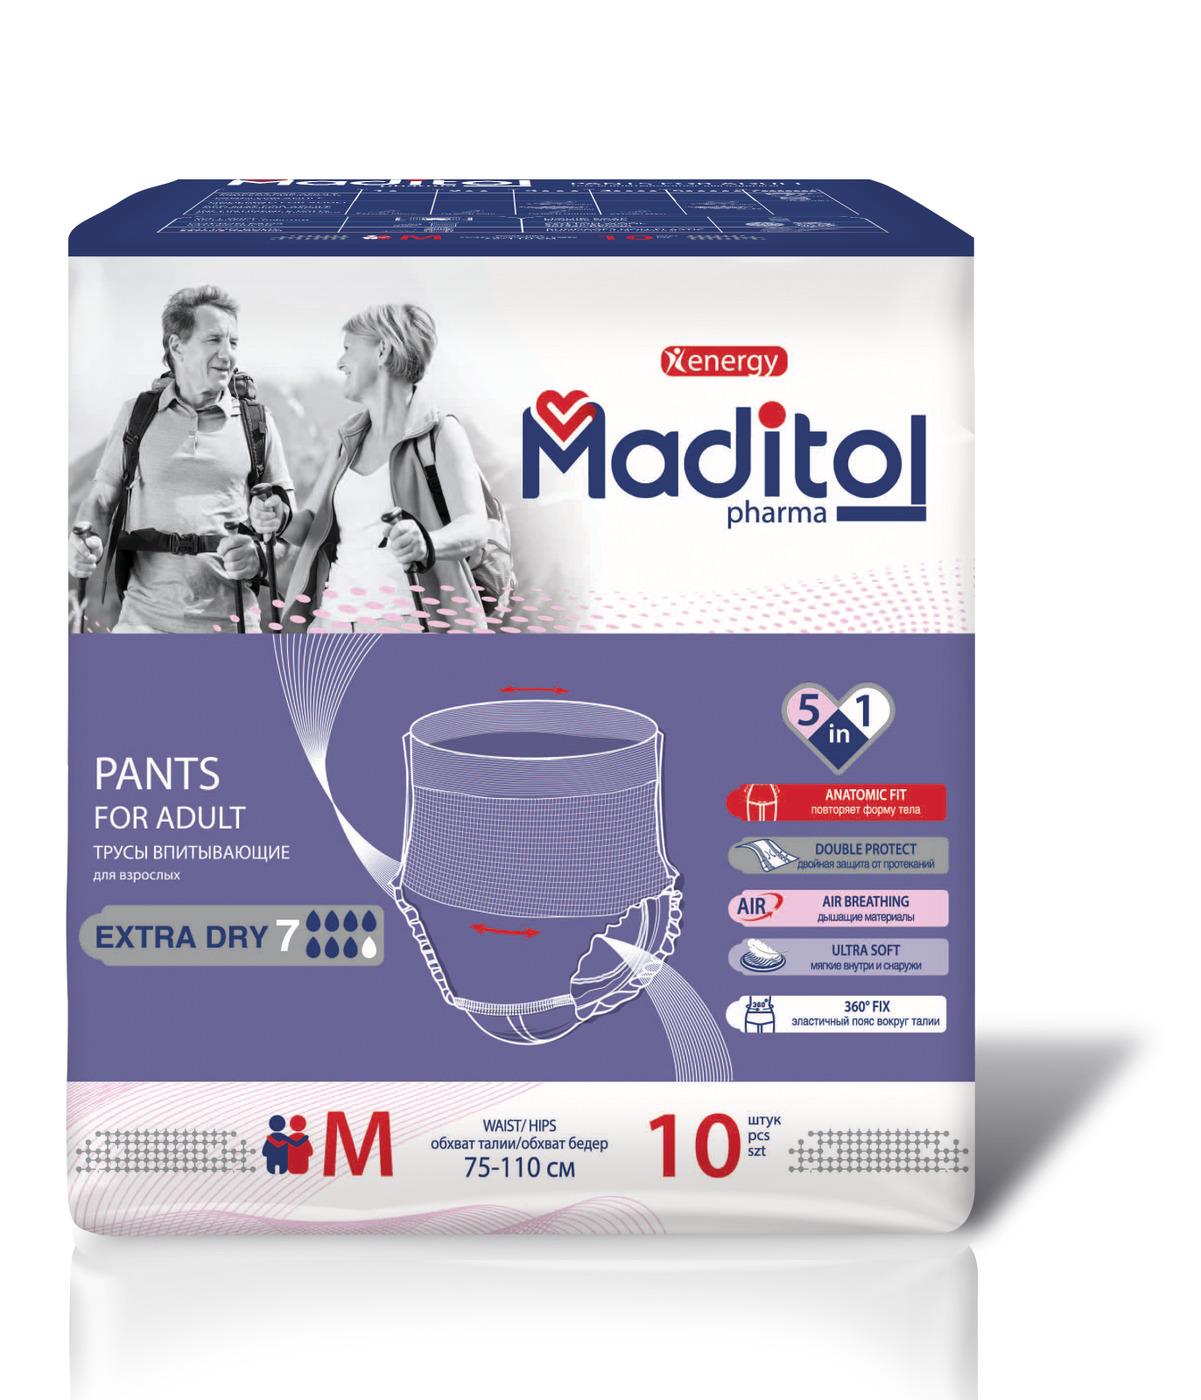 Трусы для взрослых Maditol Размер L обхват